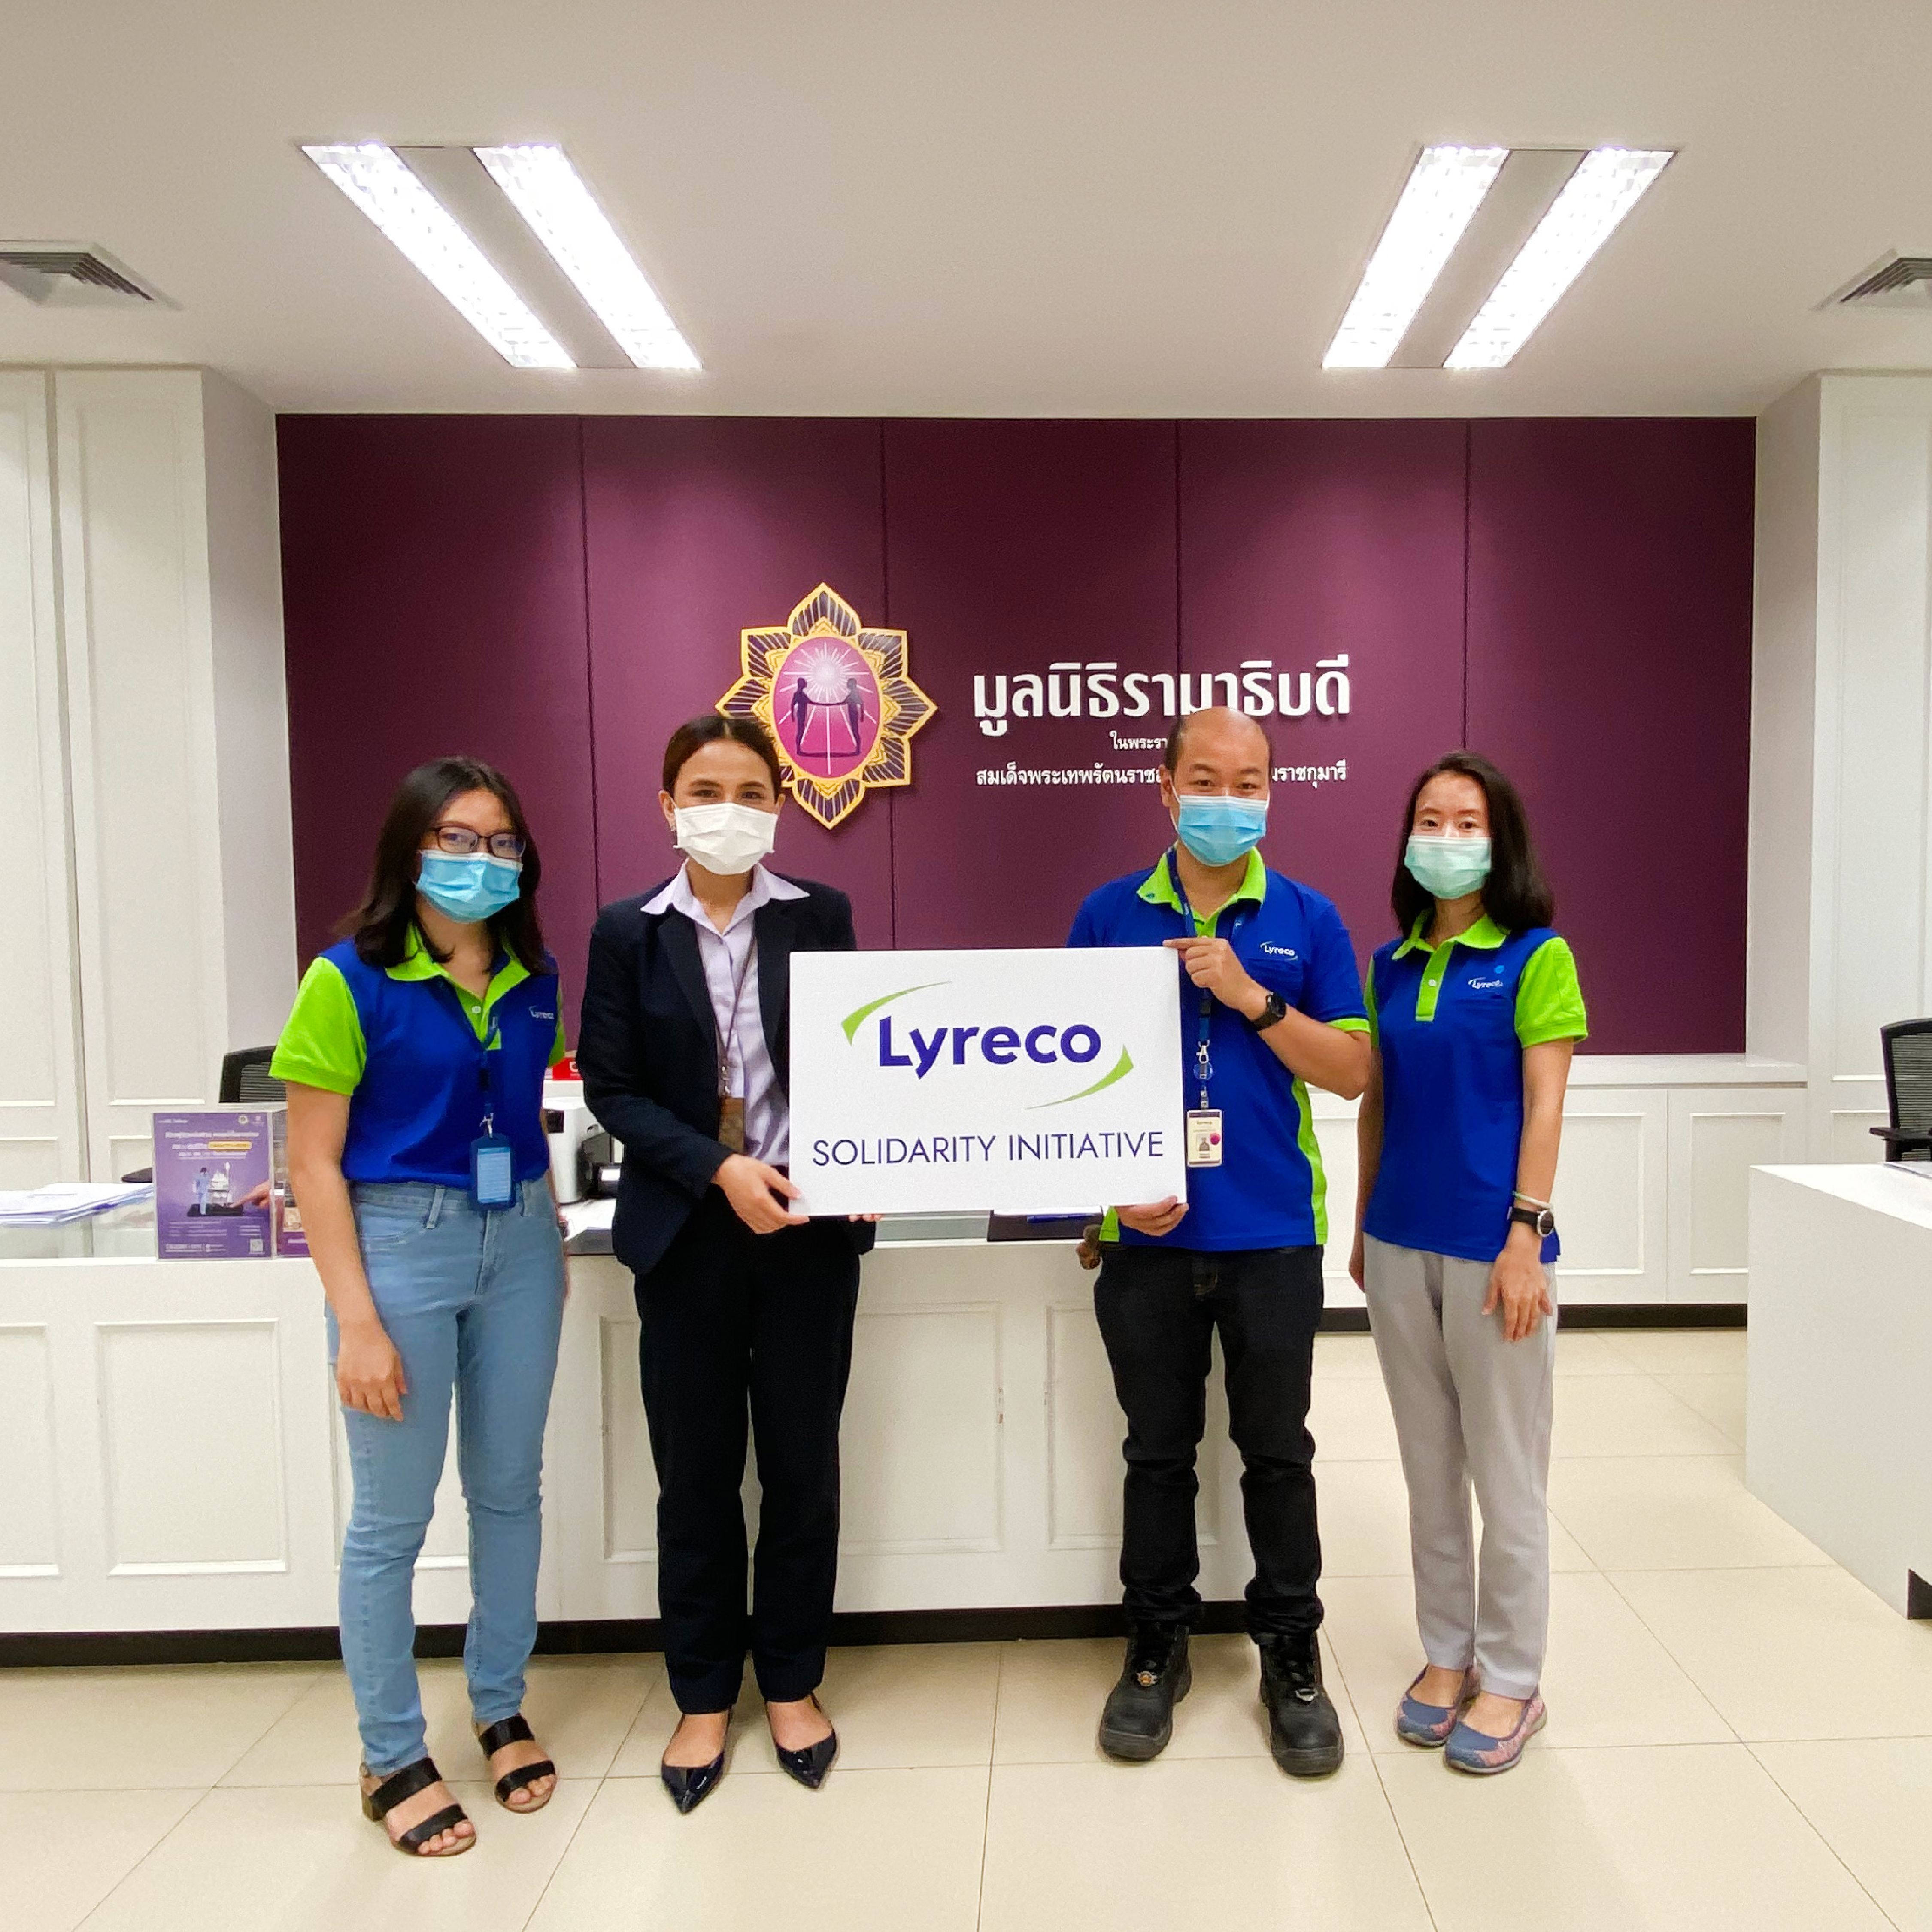 Lyreco Solidarity Initiative